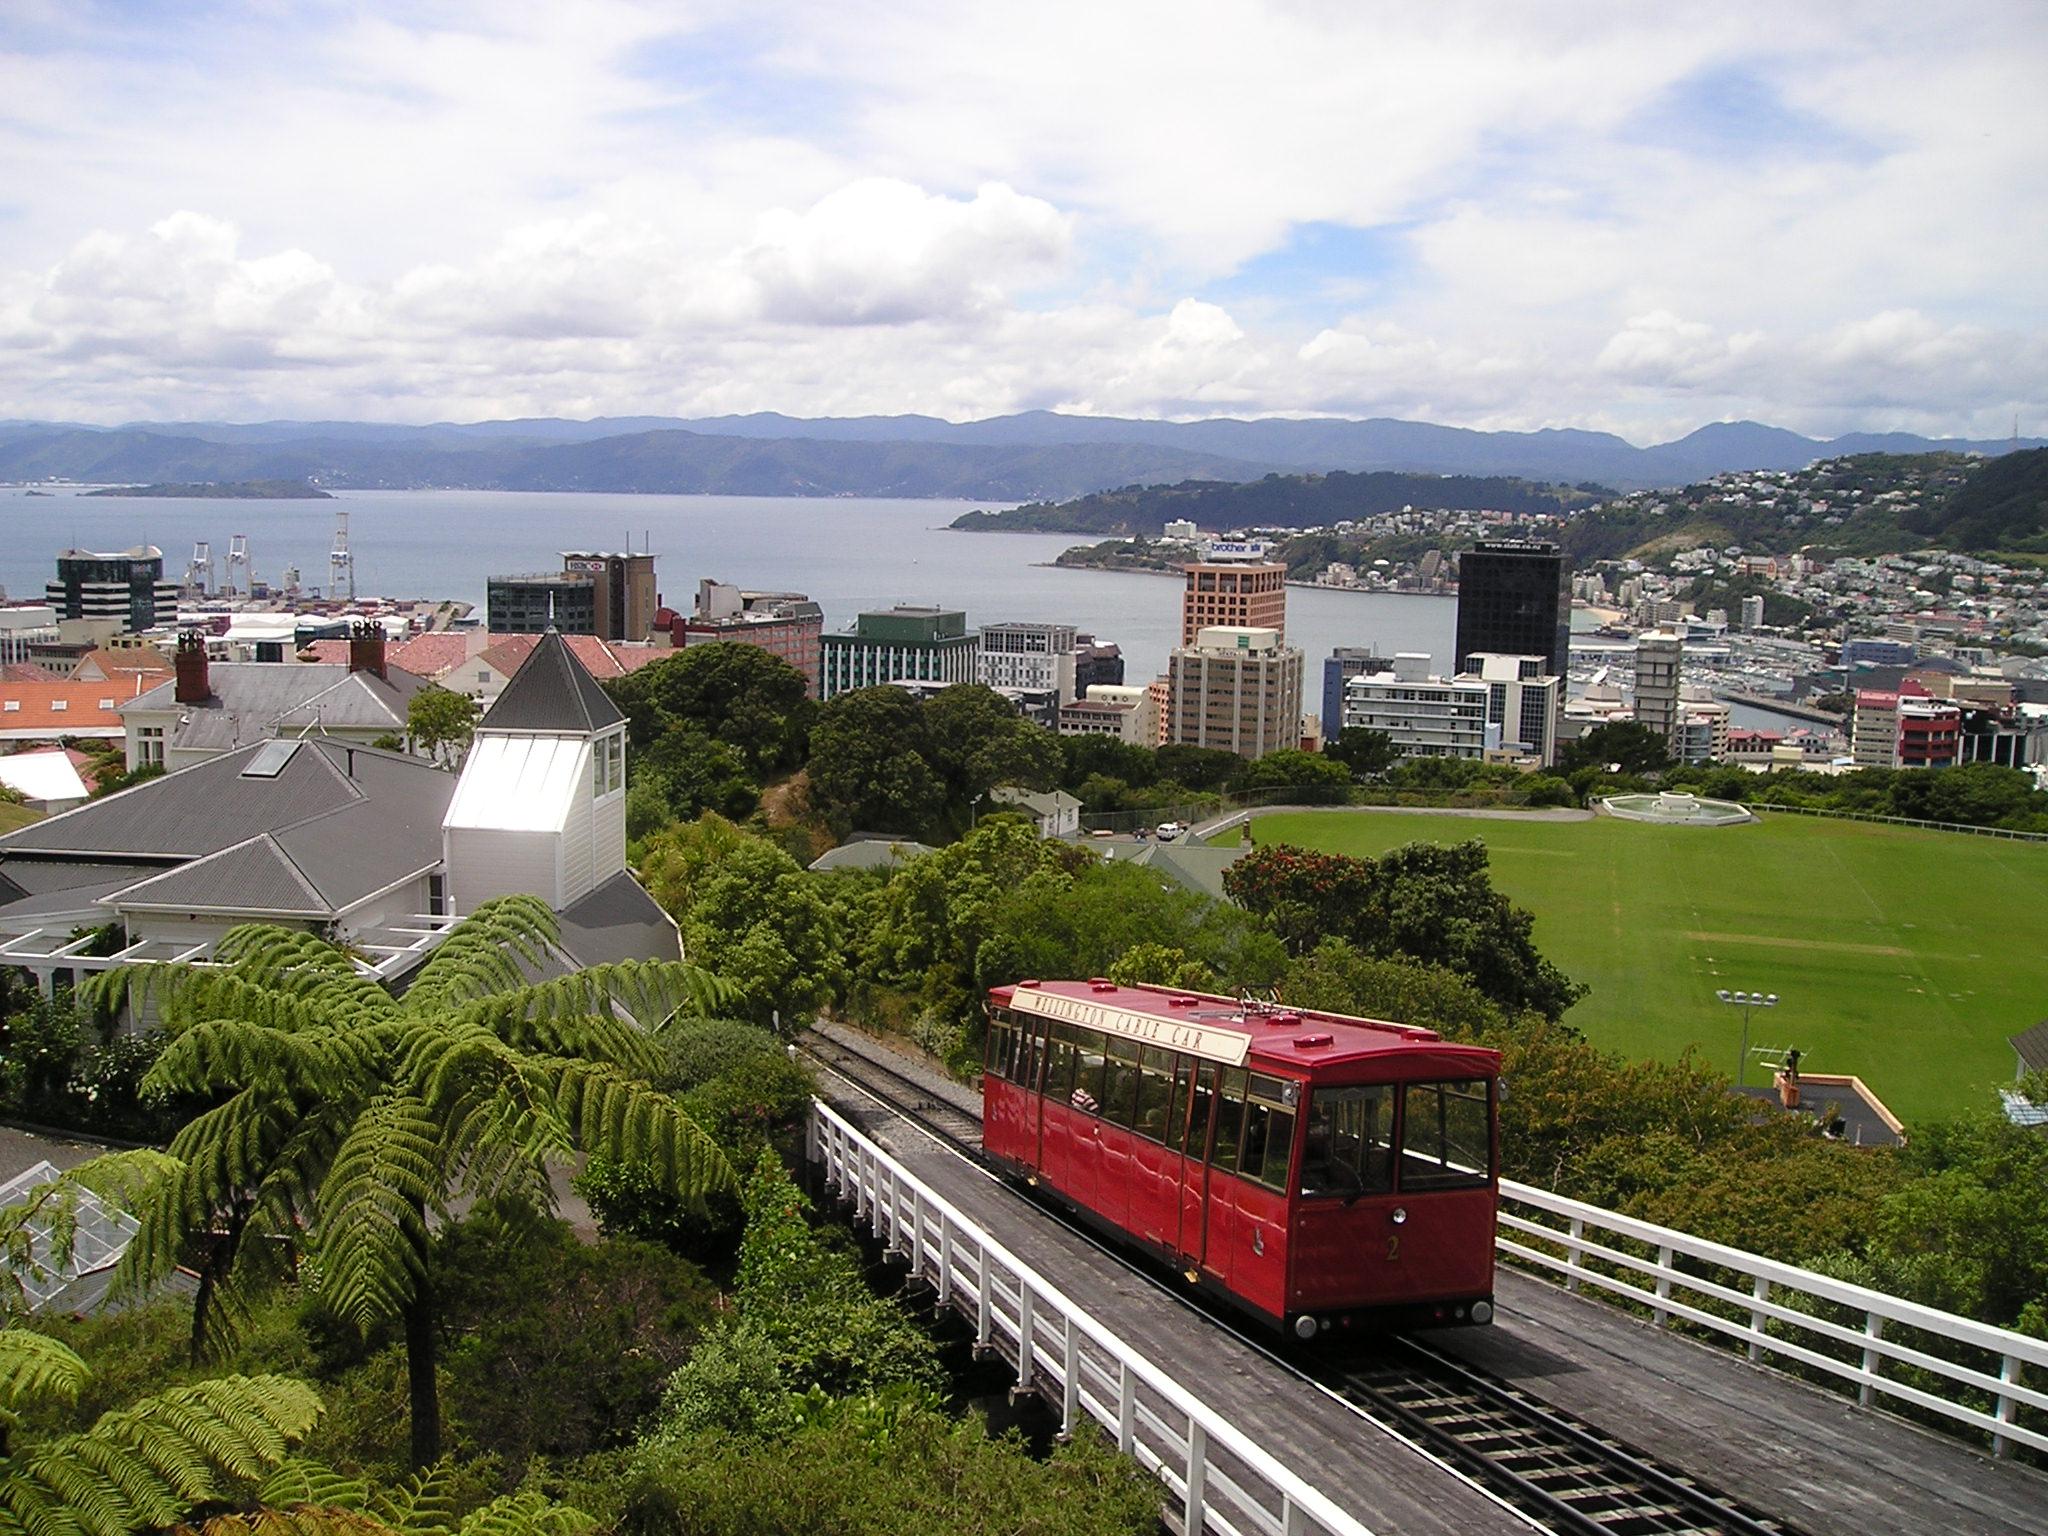 Penembakan Selandia Baru Wikipedia: File:Wellington Cable Car (public Domain).jpg